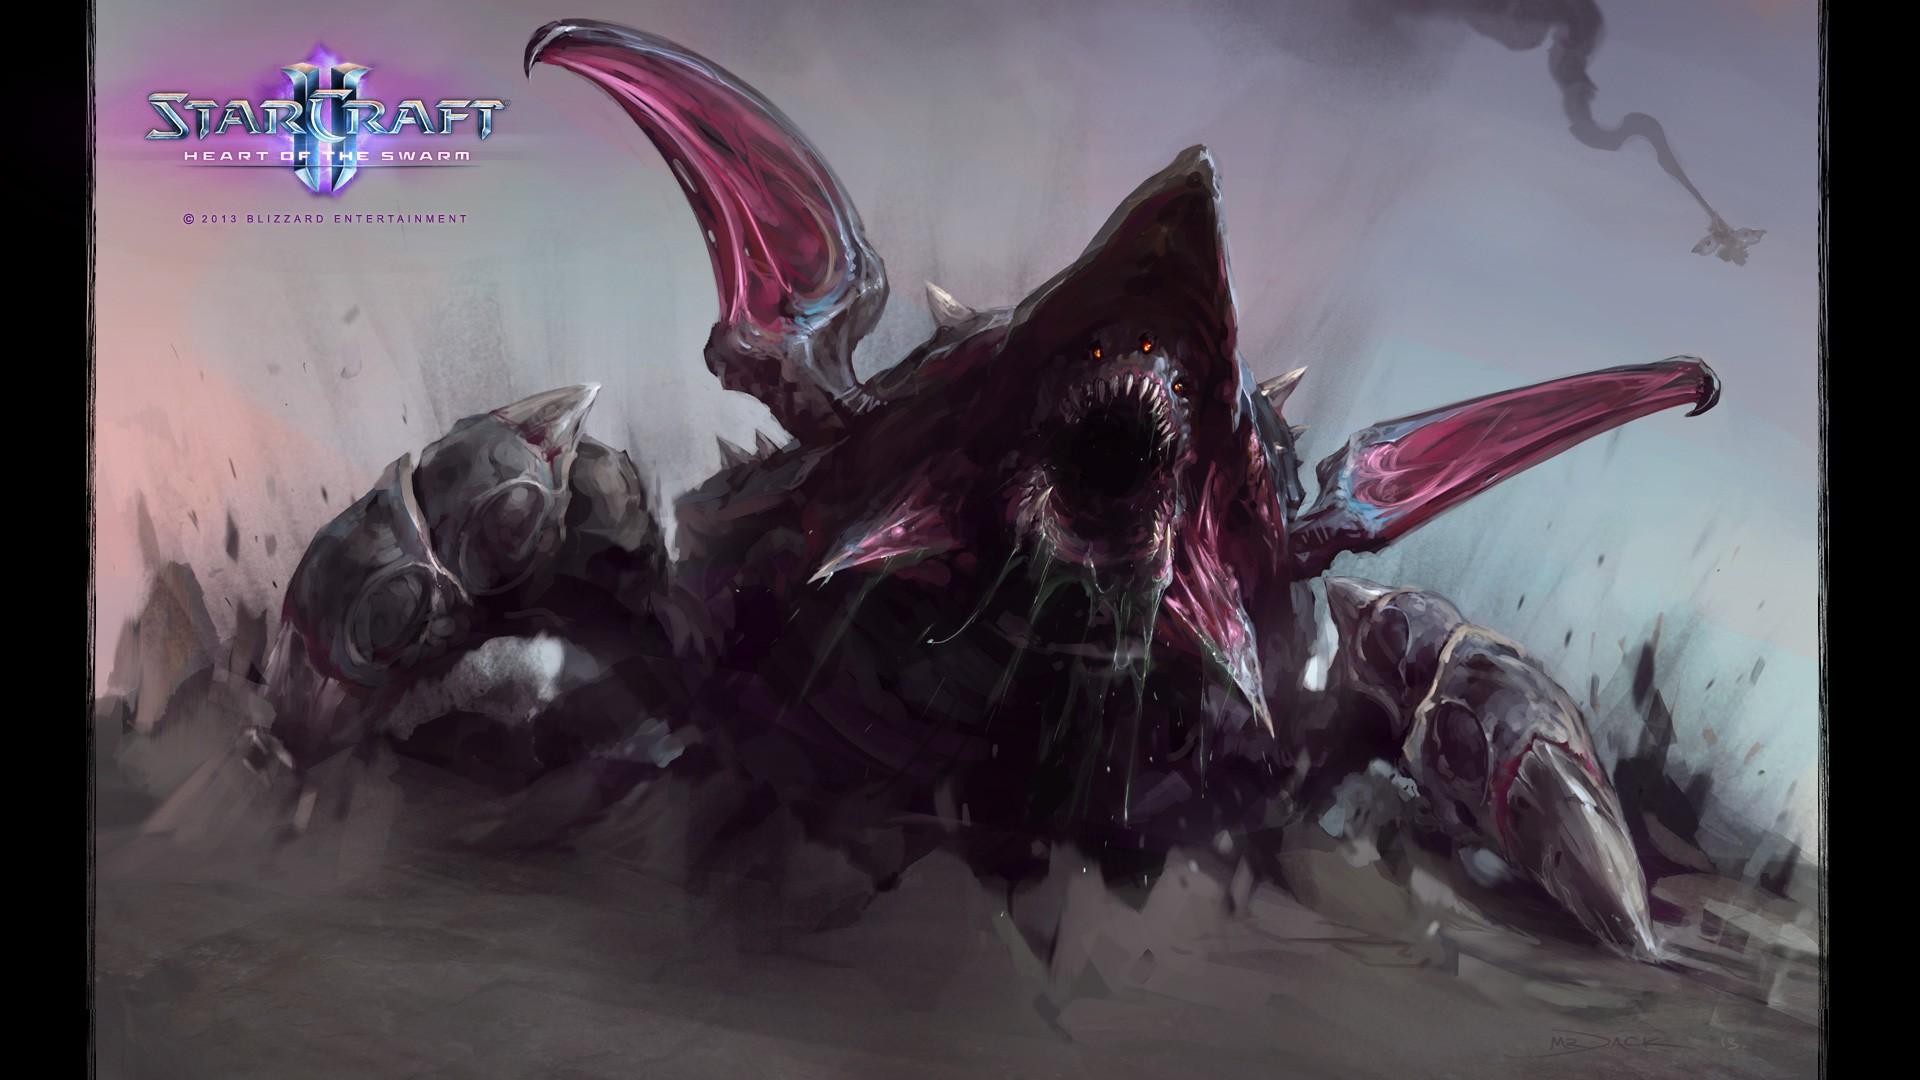 fond d'ecran anime starcraft 2